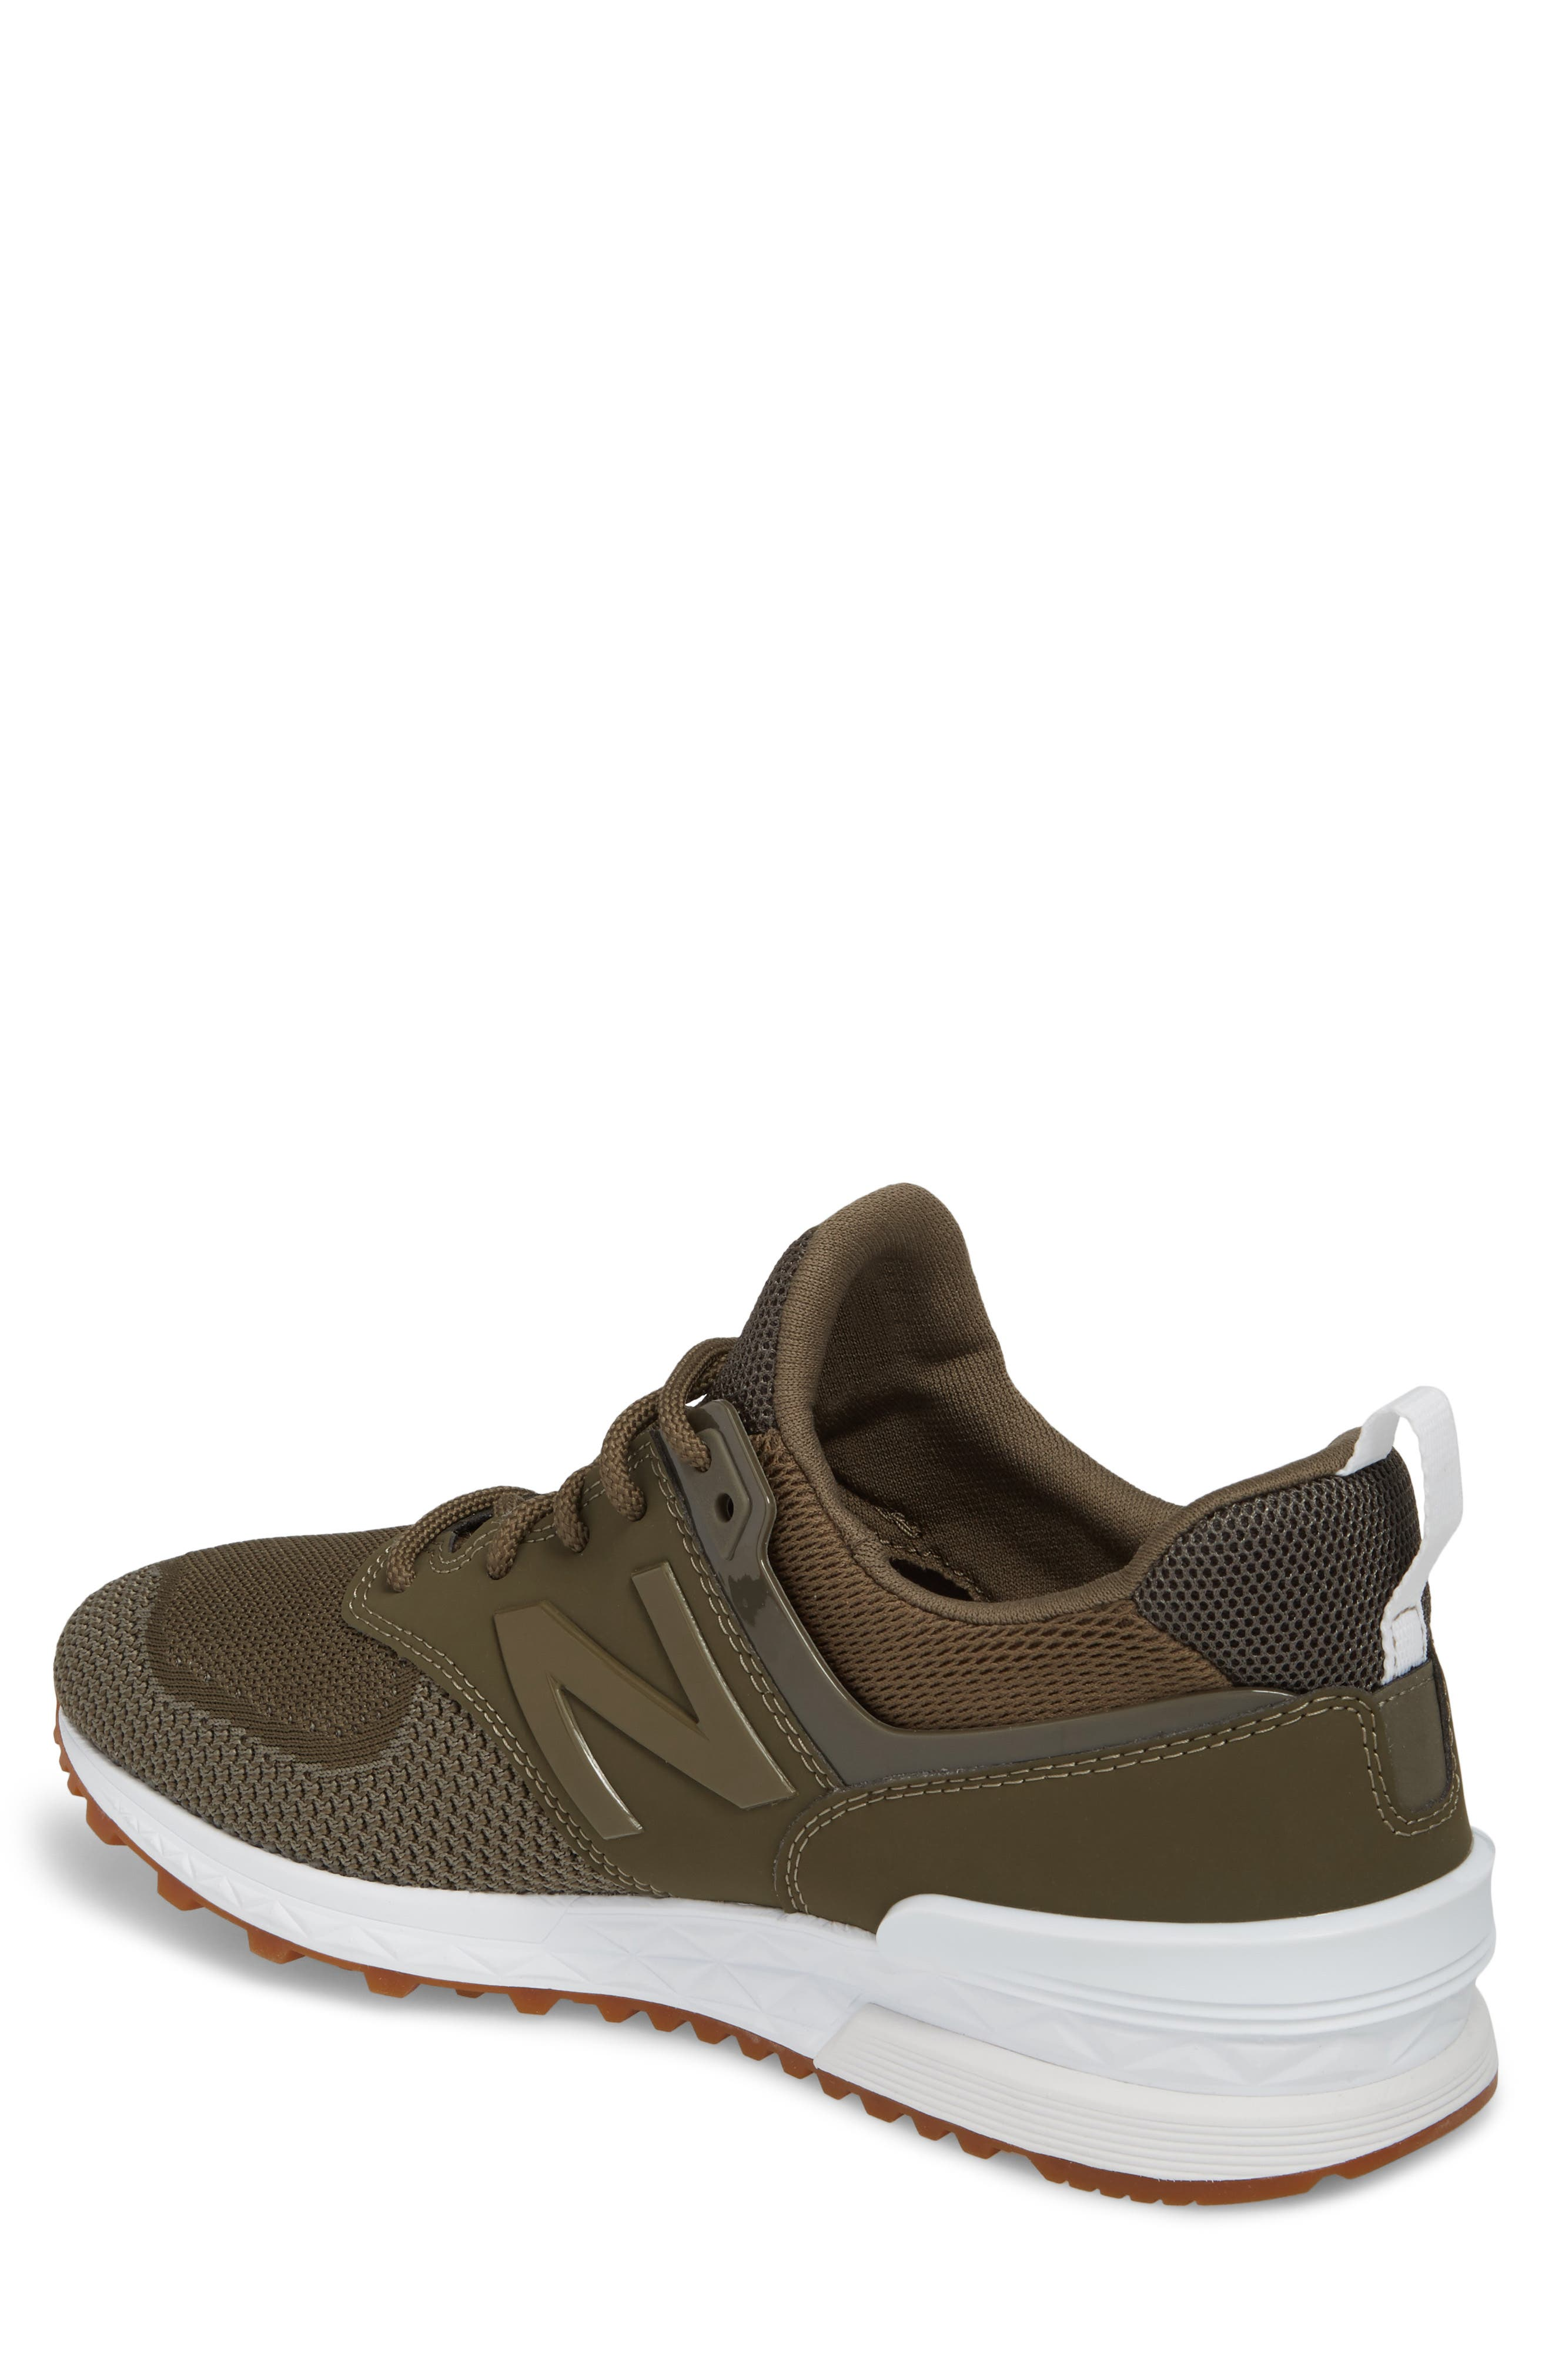 574 Engineered Mesh Sneaker,                             Alternate thumbnail 2, color,                             338